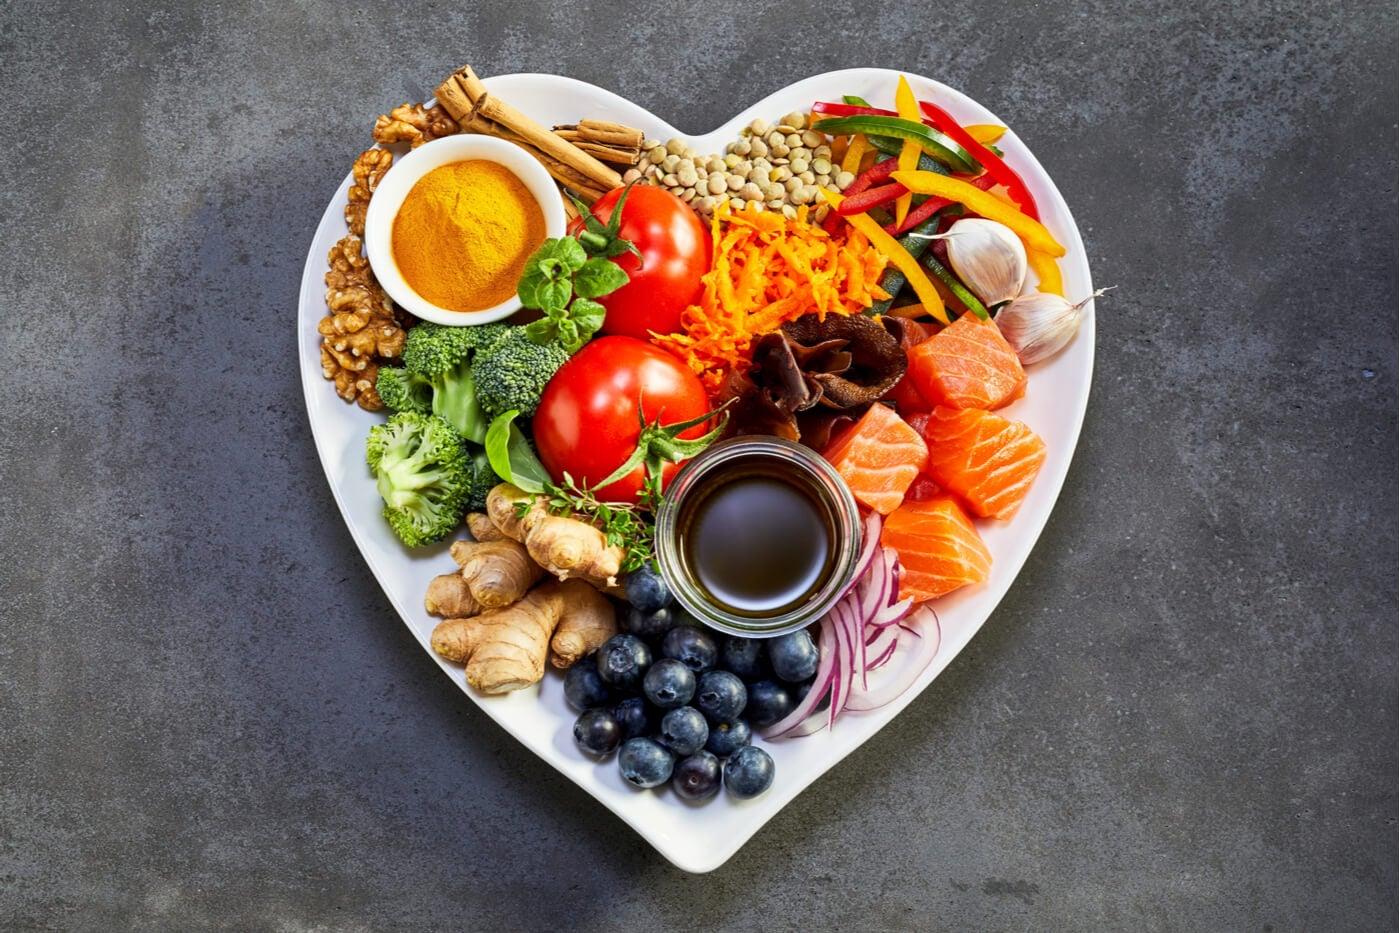 dieta balanceada salud